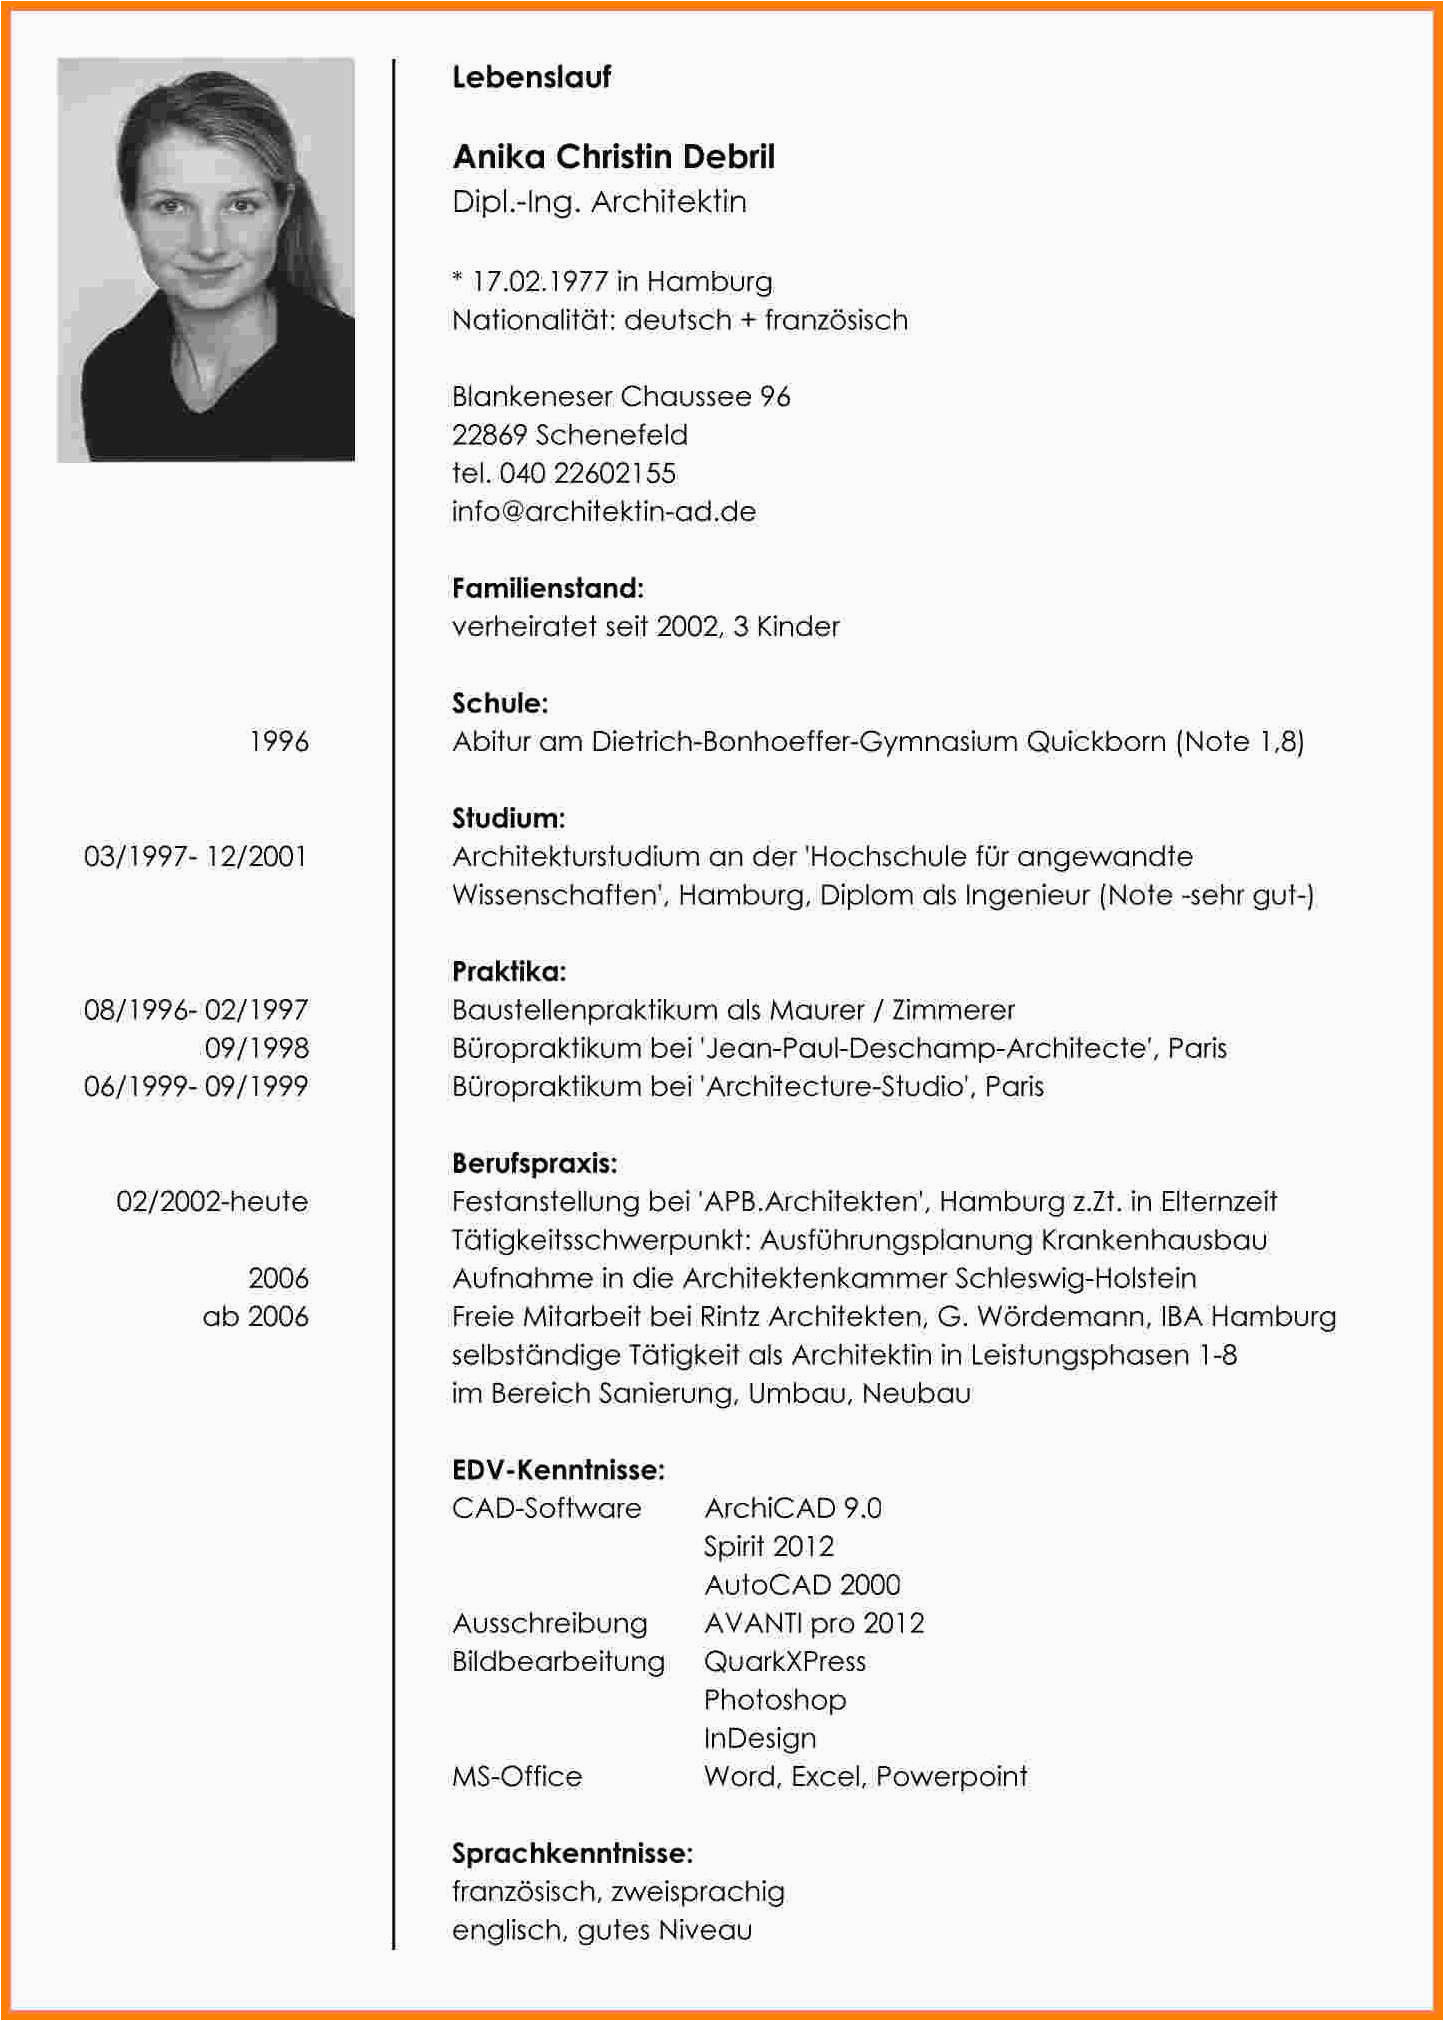 14 Lebenslauf Abitur Oberteil Fur Lebenslauf Schuler Vorlage Pdf Lebenslauf Schuler Vorlage